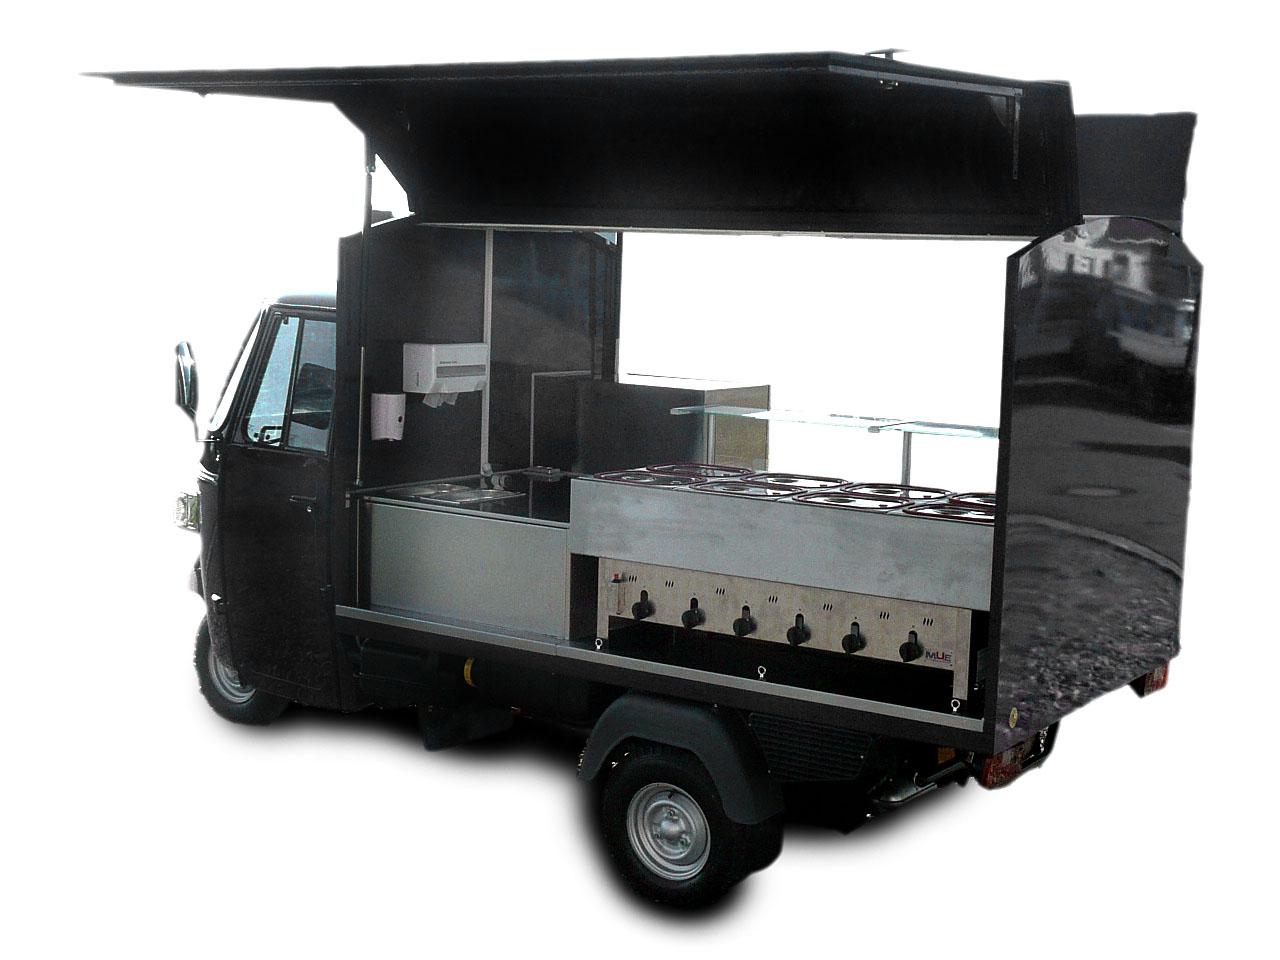 piaggio ape classic warme theke casa moto shop. Black Bedroom Furniture Sets. Home Design Ideas